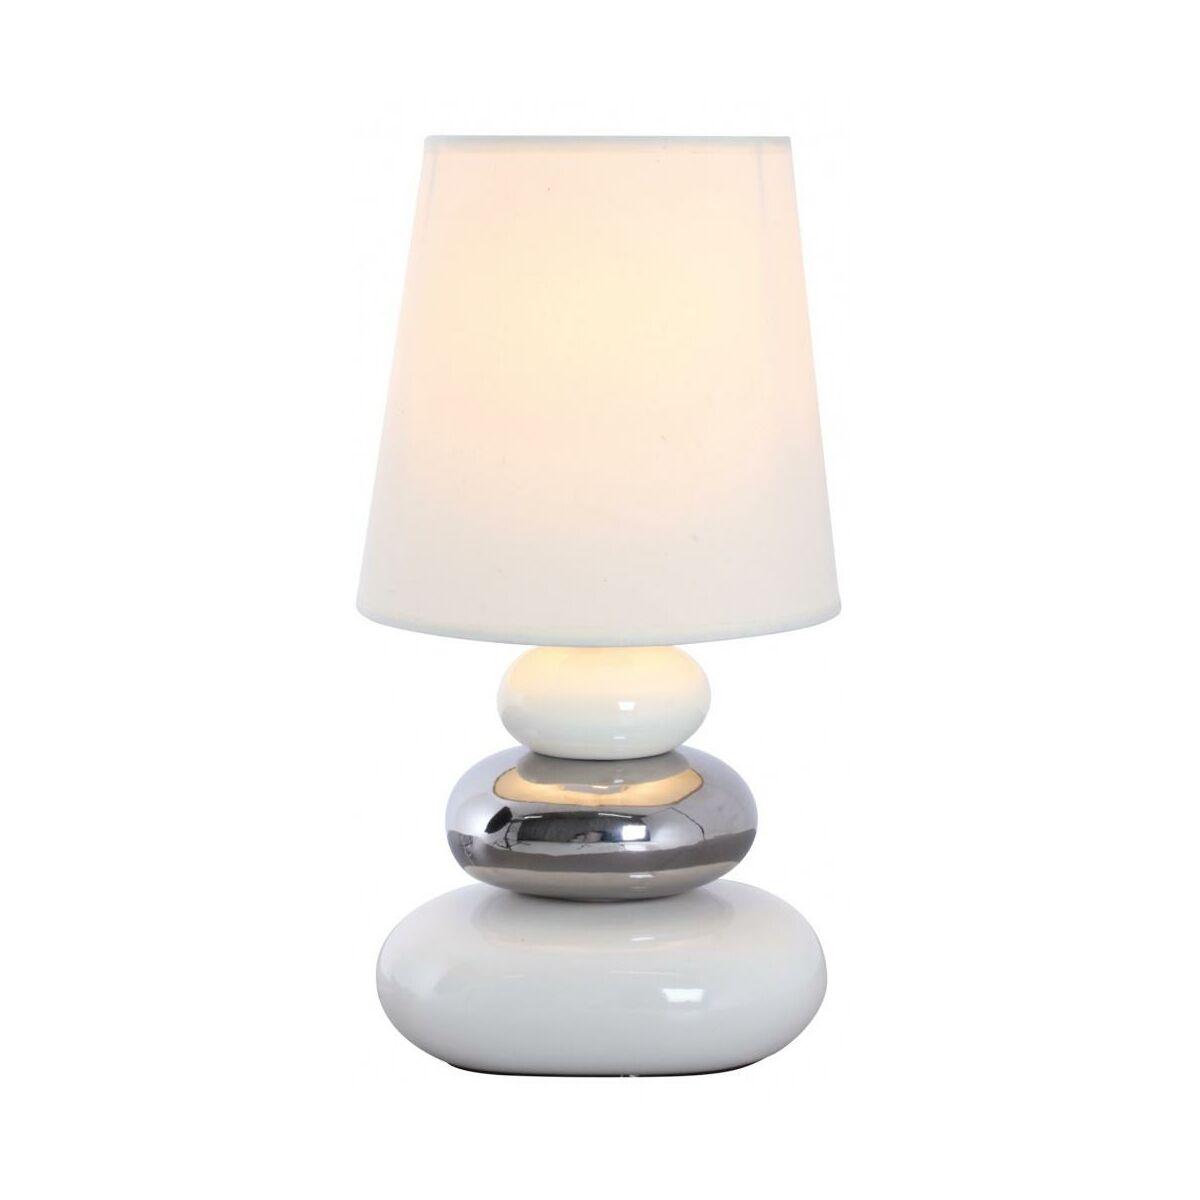 lampy nocne stojące leroy merlin